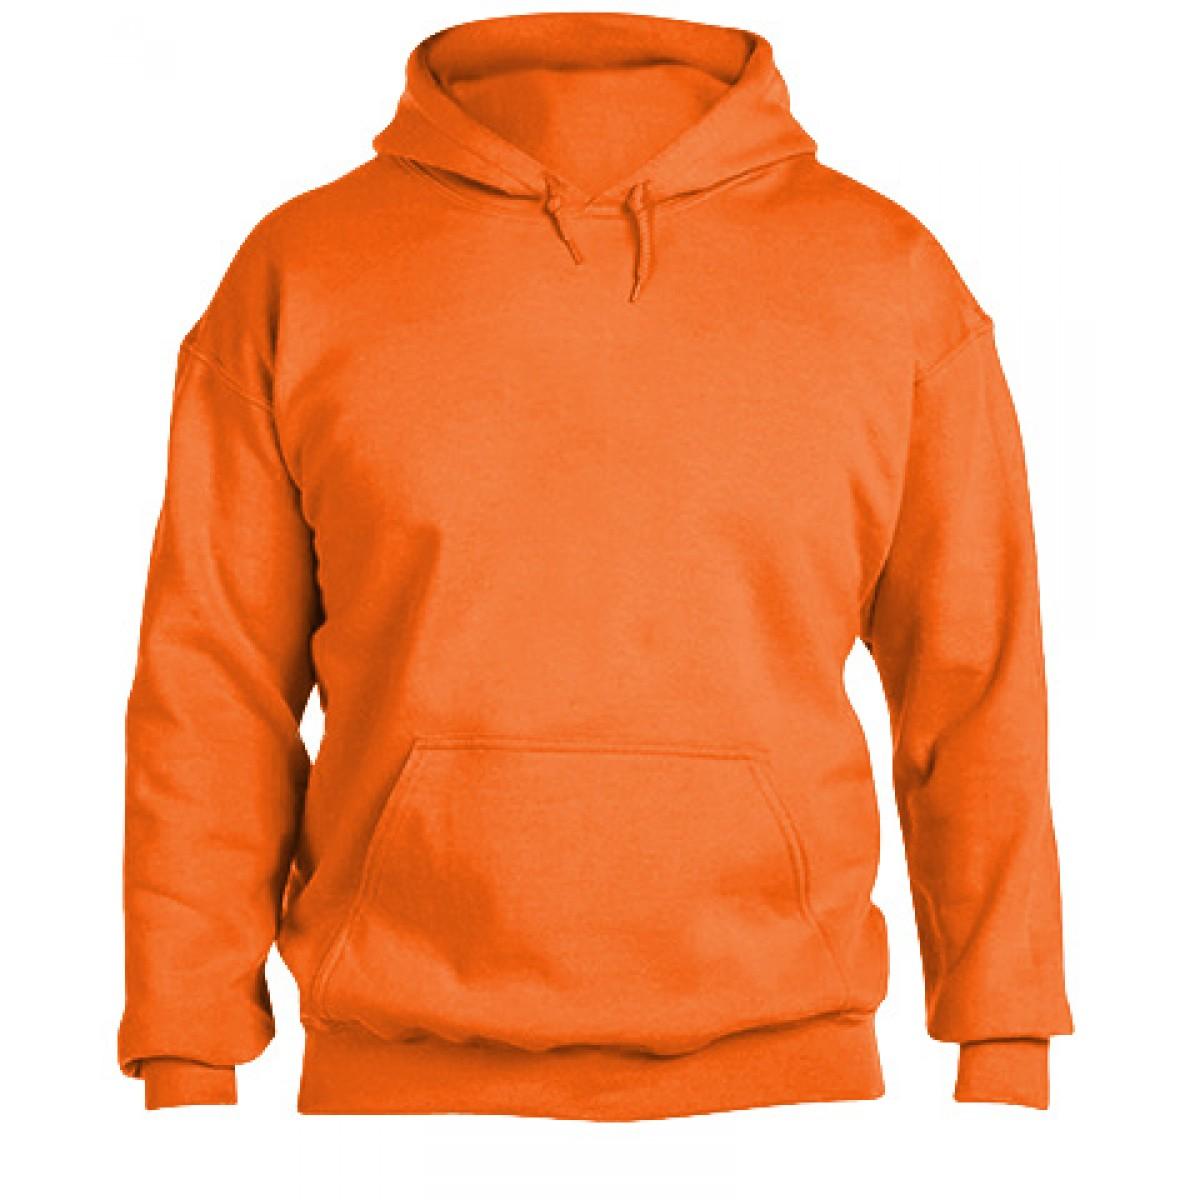 Hooded Sweatshirt 50/50 Heavy Blend -Safety Orange-XL